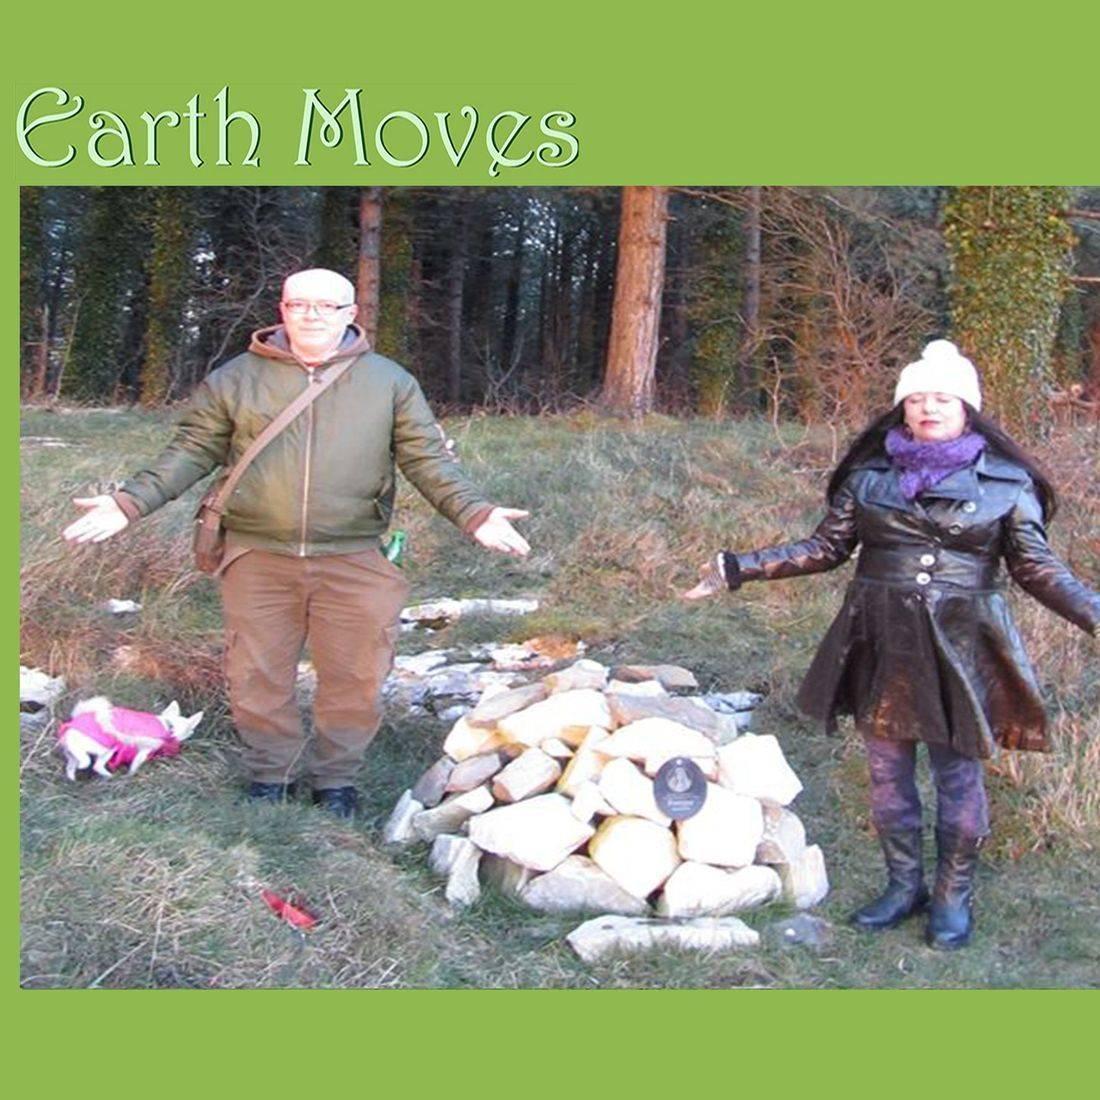 Earthmoves goddess spiritual Wales Freya altar  energy joyful